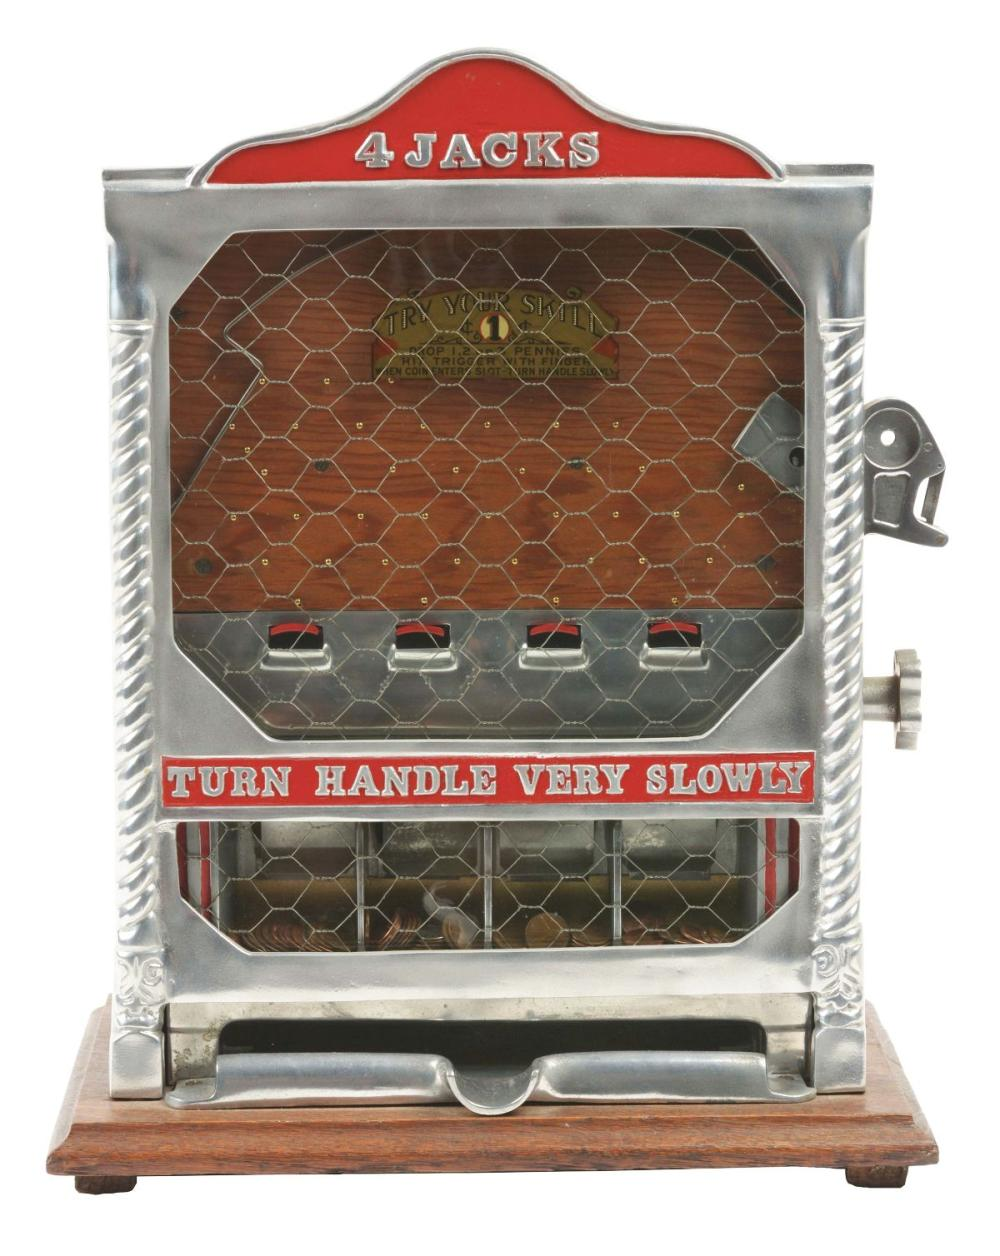 1¢ FIELDS JACKS COUNTER POCKET TRADE STIMULATOR.